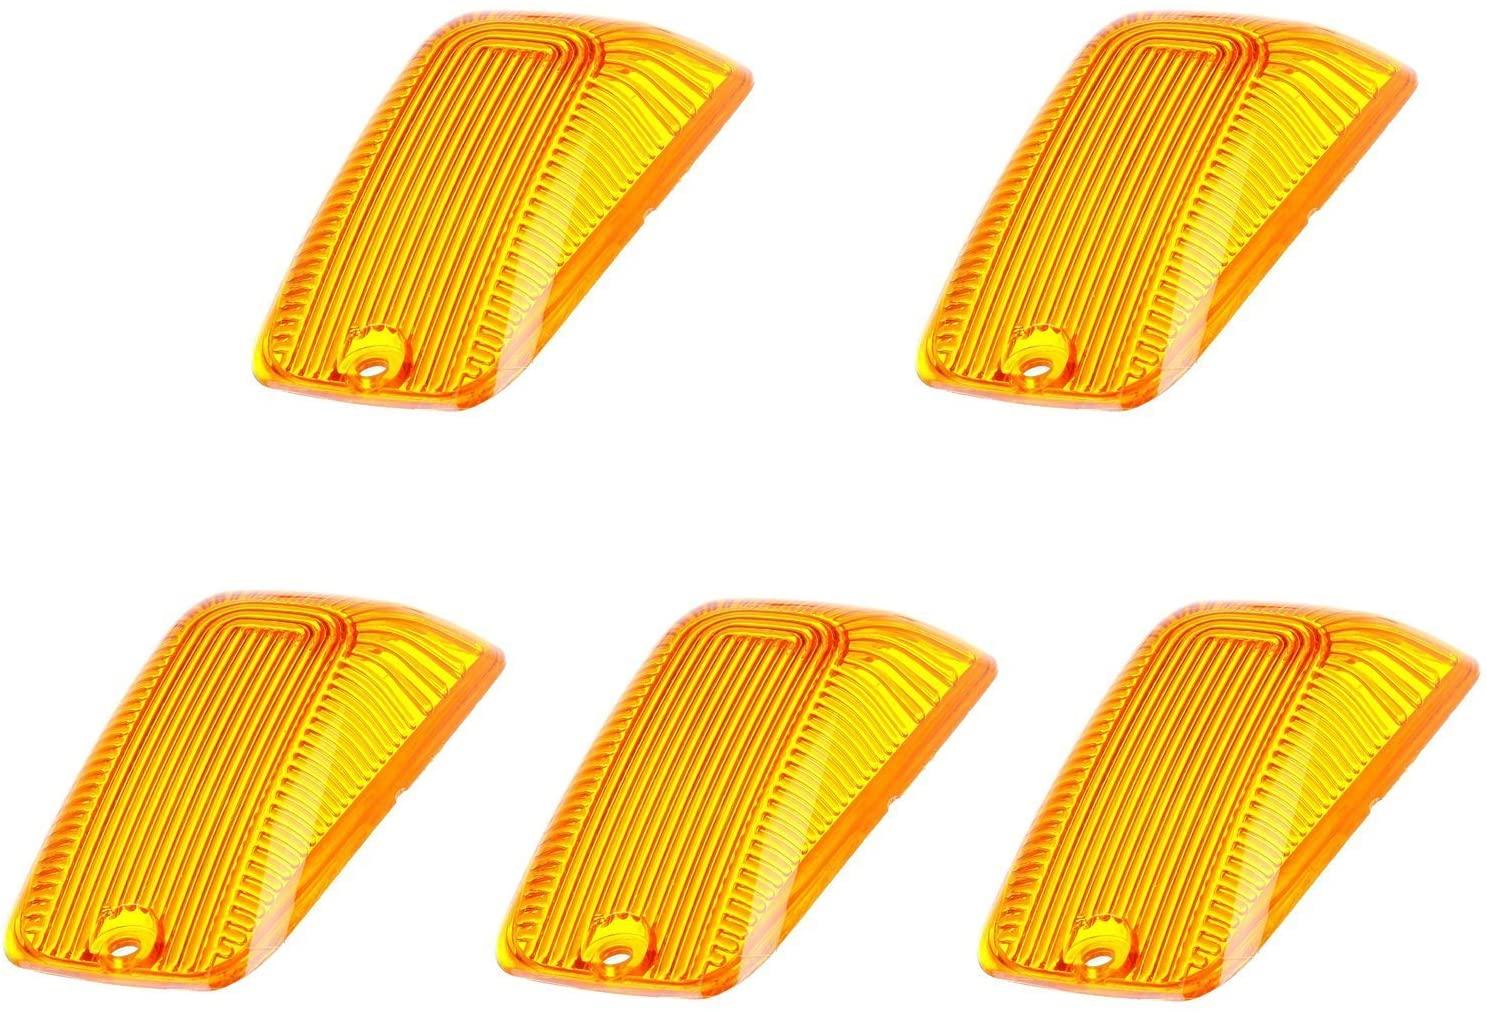 5 X Cab Marker Light Amber Cover, Cab Roof Running Lights, Top Light for 1988-2002 Chevy/GMC C1500 C2500 C3500 K1500 K2500 K3500 Pickup Trucks (Only Cover)